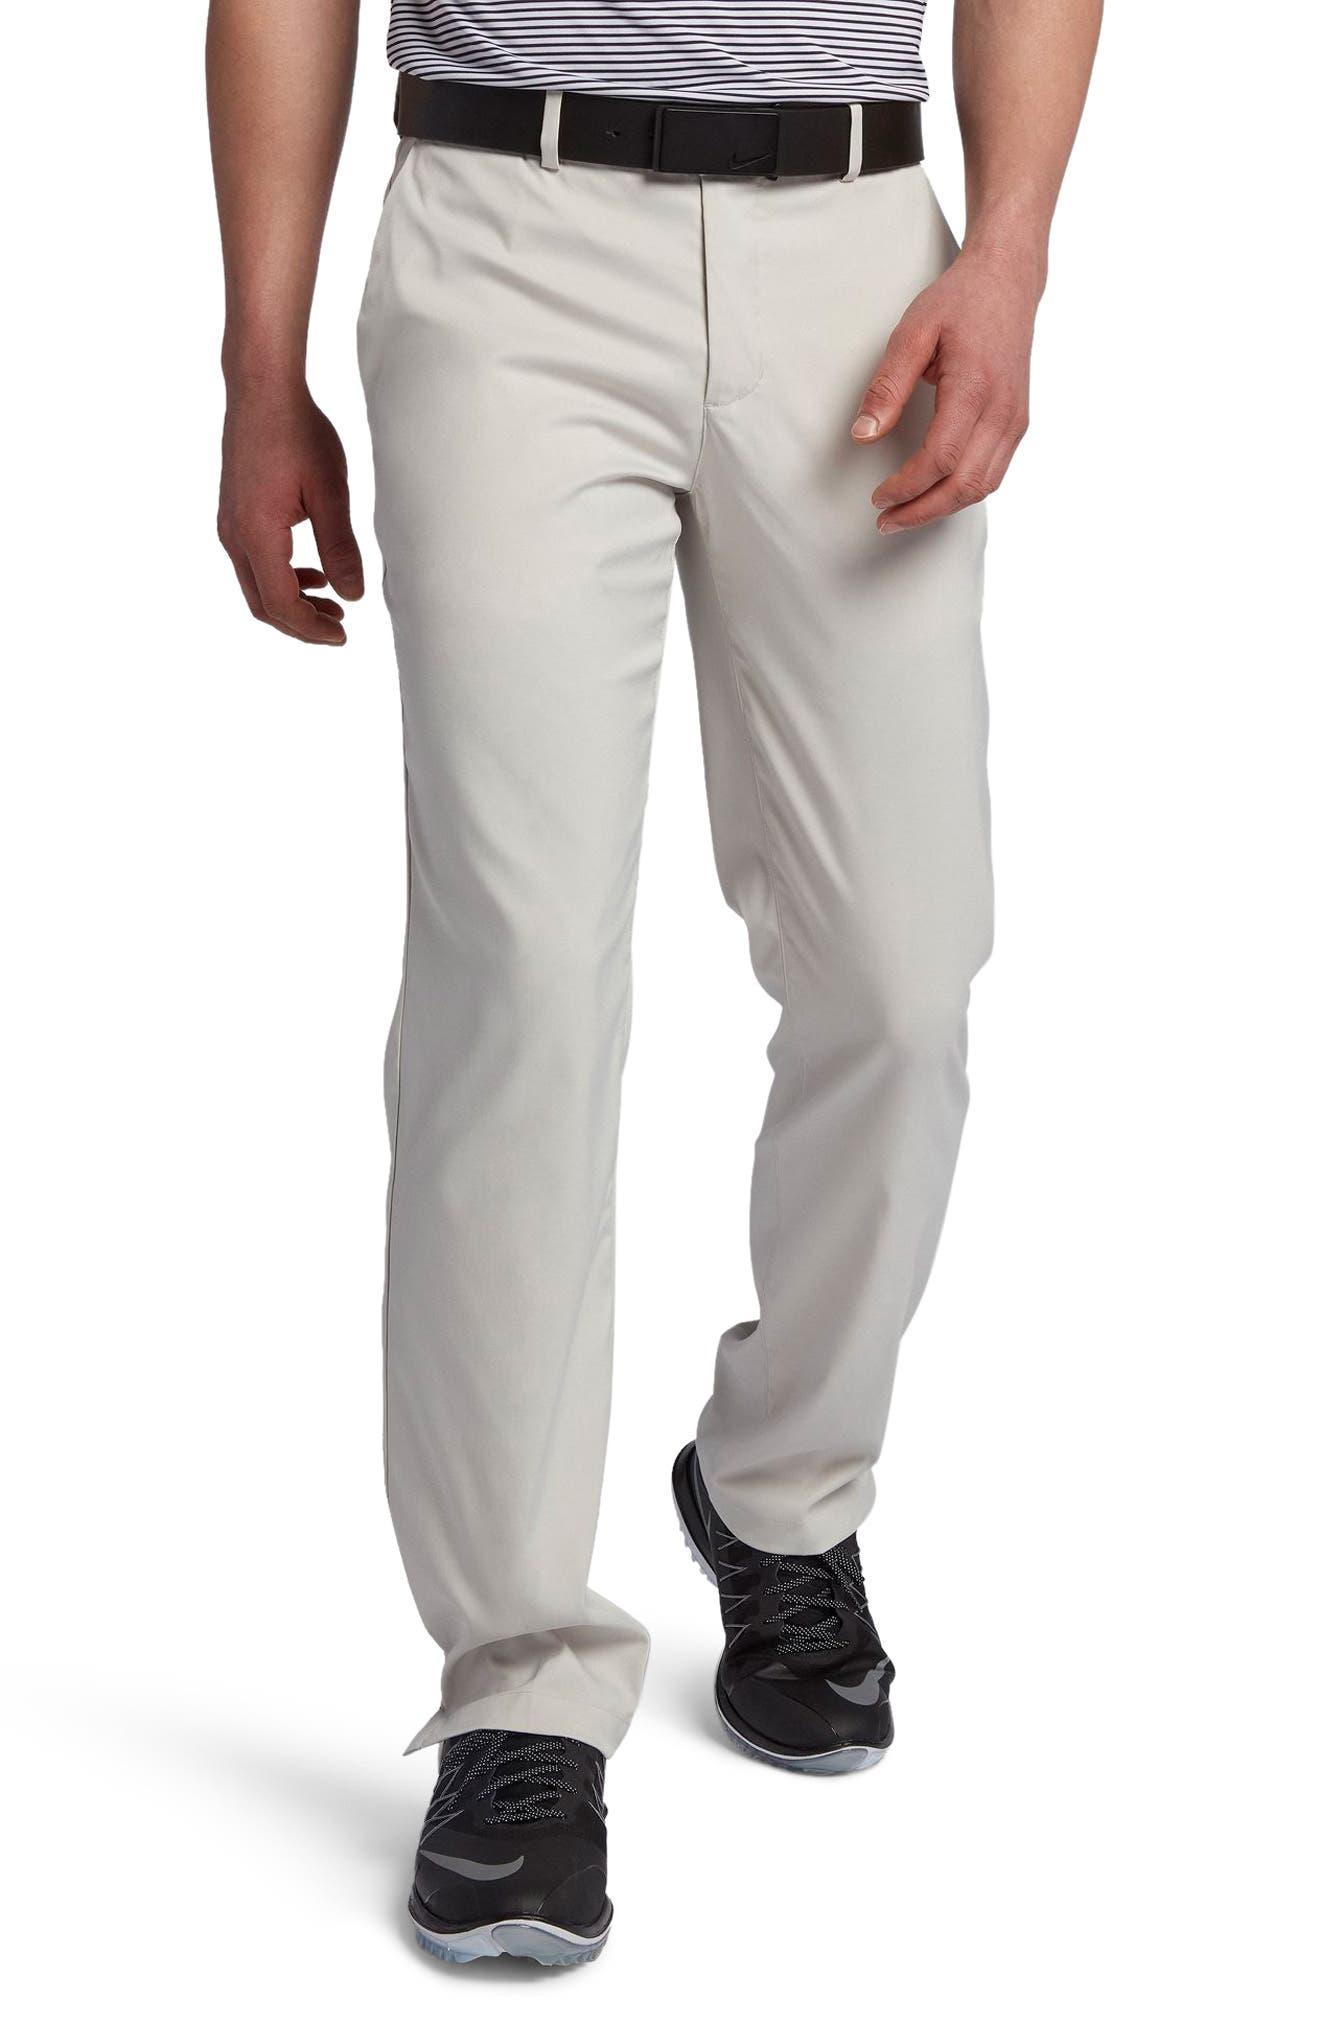 Flat Front Dri-FIT Tech Golf Pants,                             Main thumbnail 1, color,                             LIGHT BONE/ LIGHT BONE